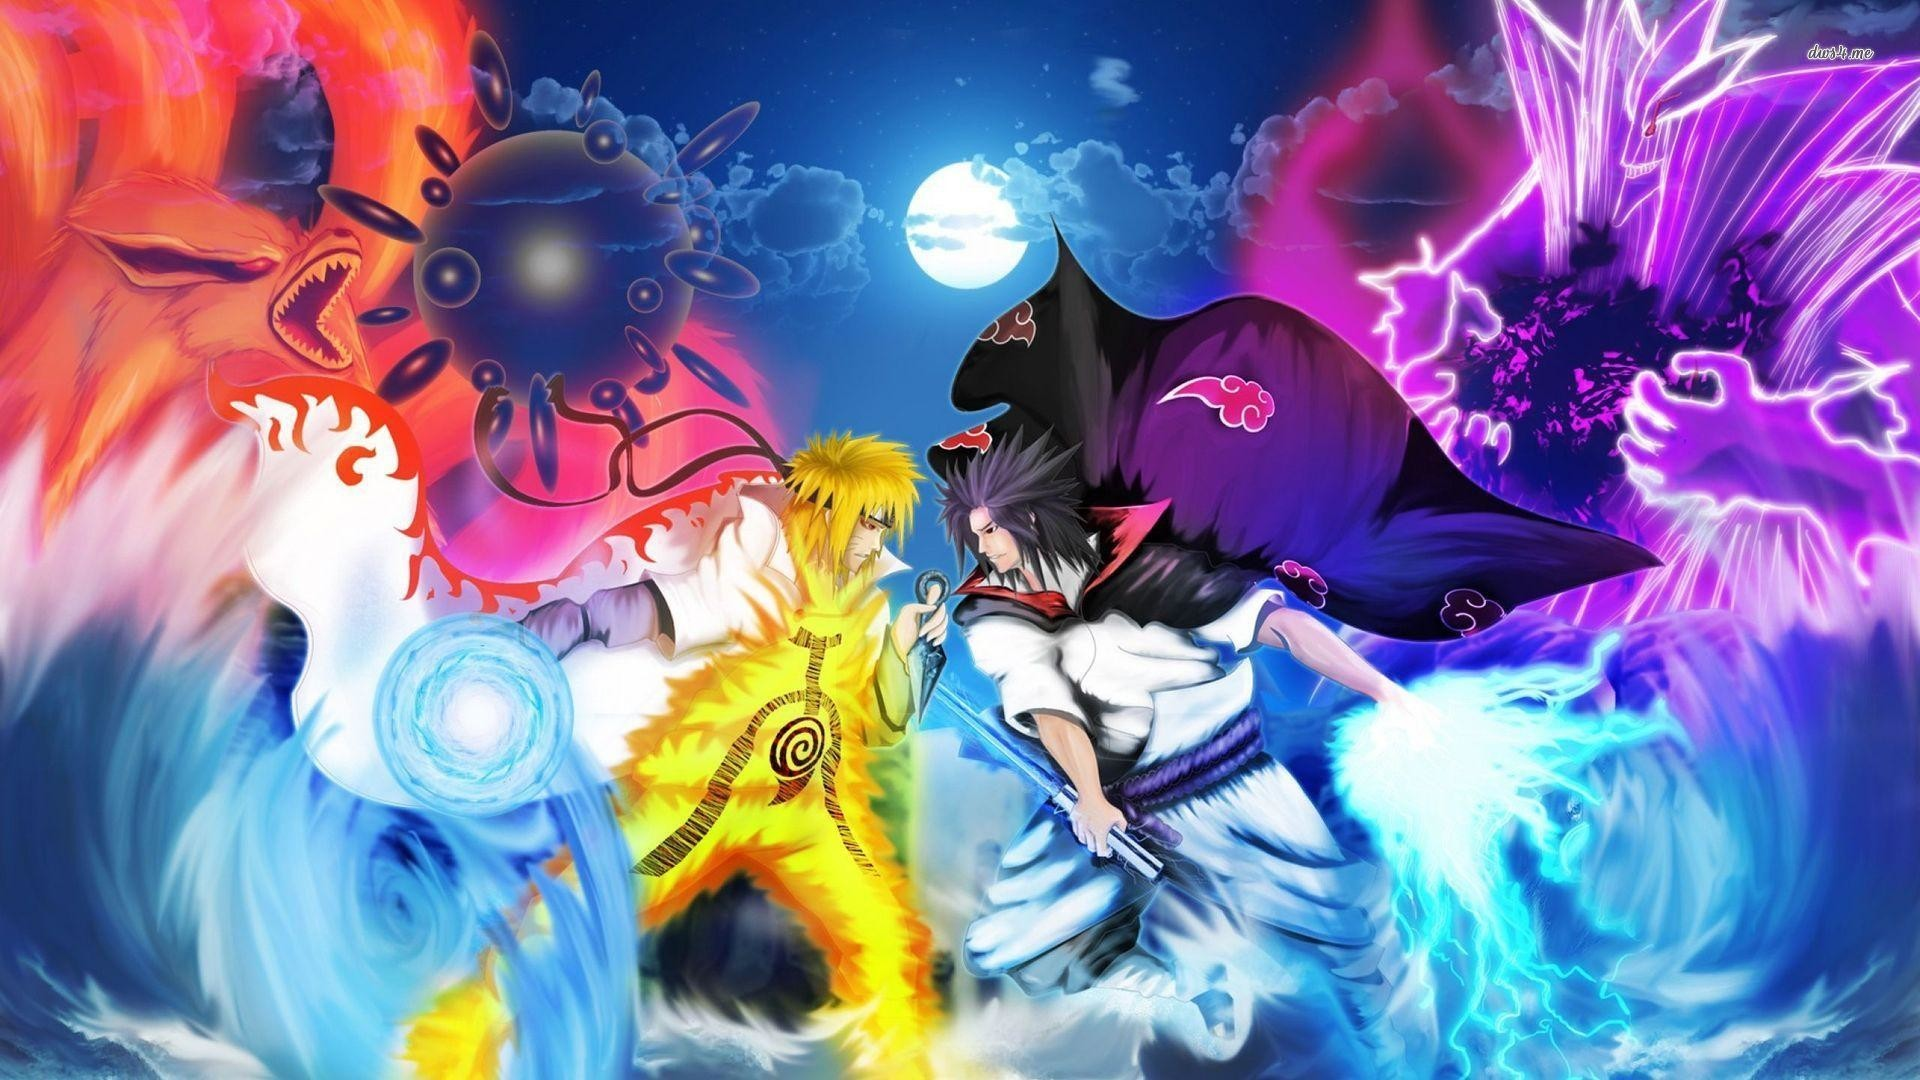 Naruto Shippuden Wallpaper Terbaru 2018 52 Images